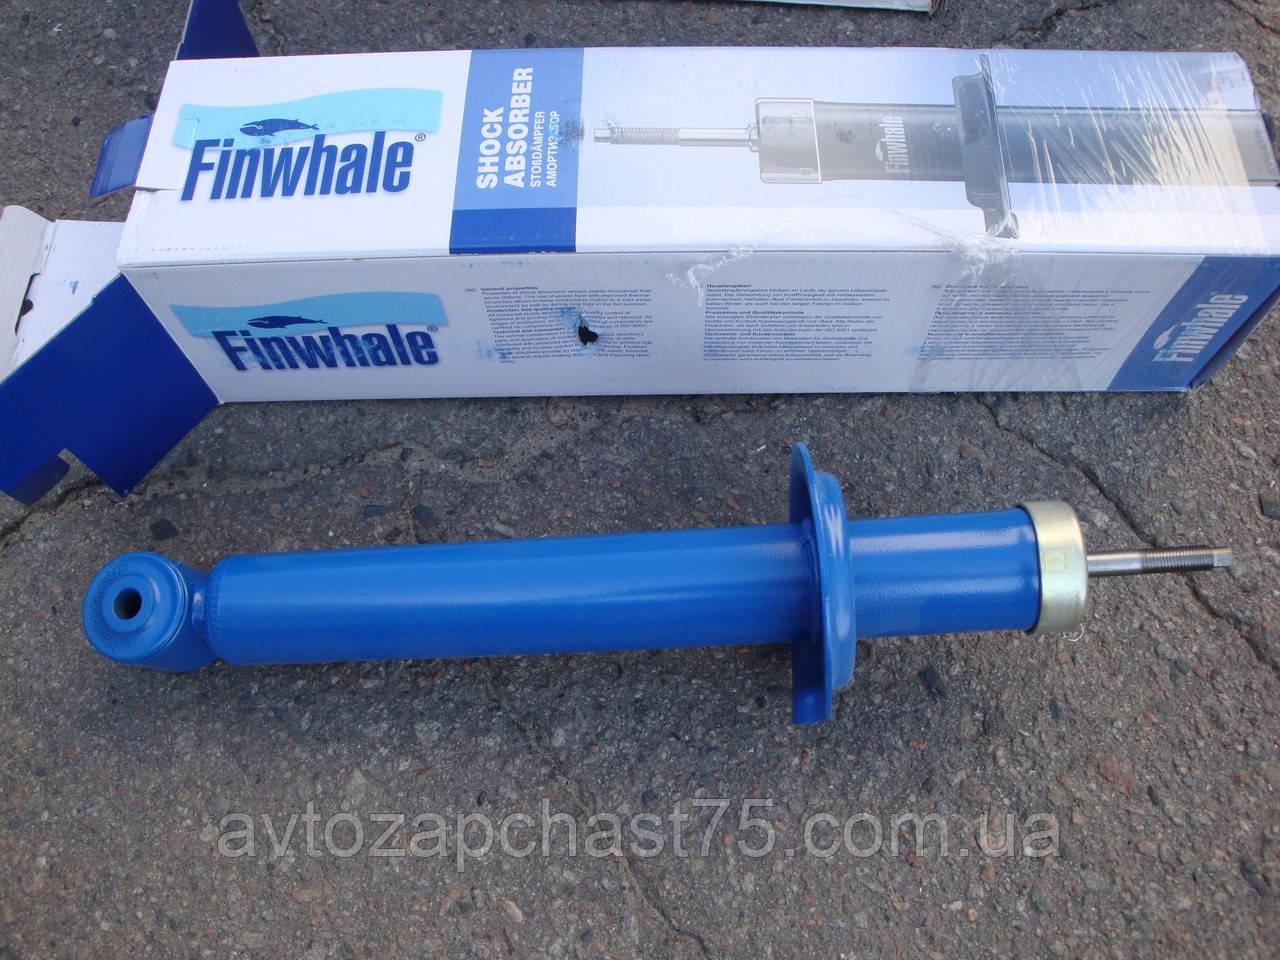 Амортизатор Ваз 2108, ваз 2109, 2113, 2114,ваз 2115 (производитель Finwhale, Германия)